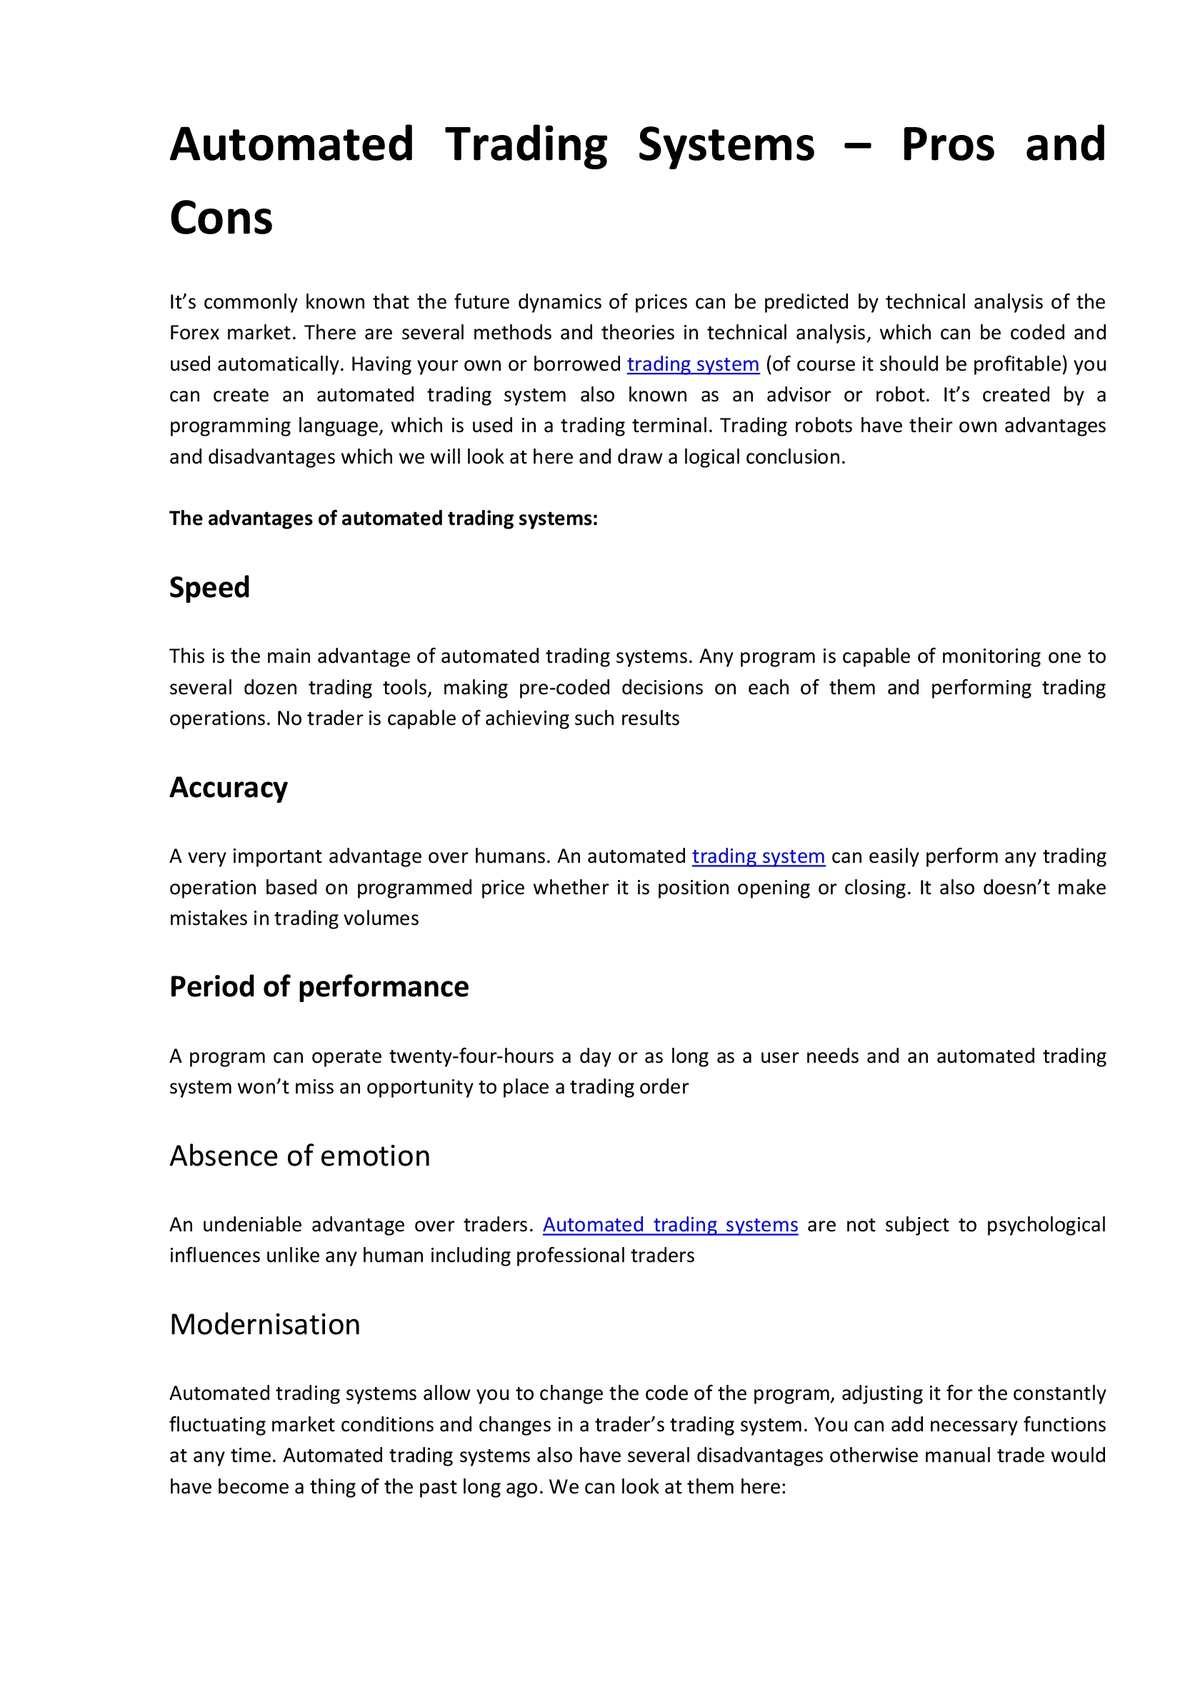 advantages and disadvantages of modernisation